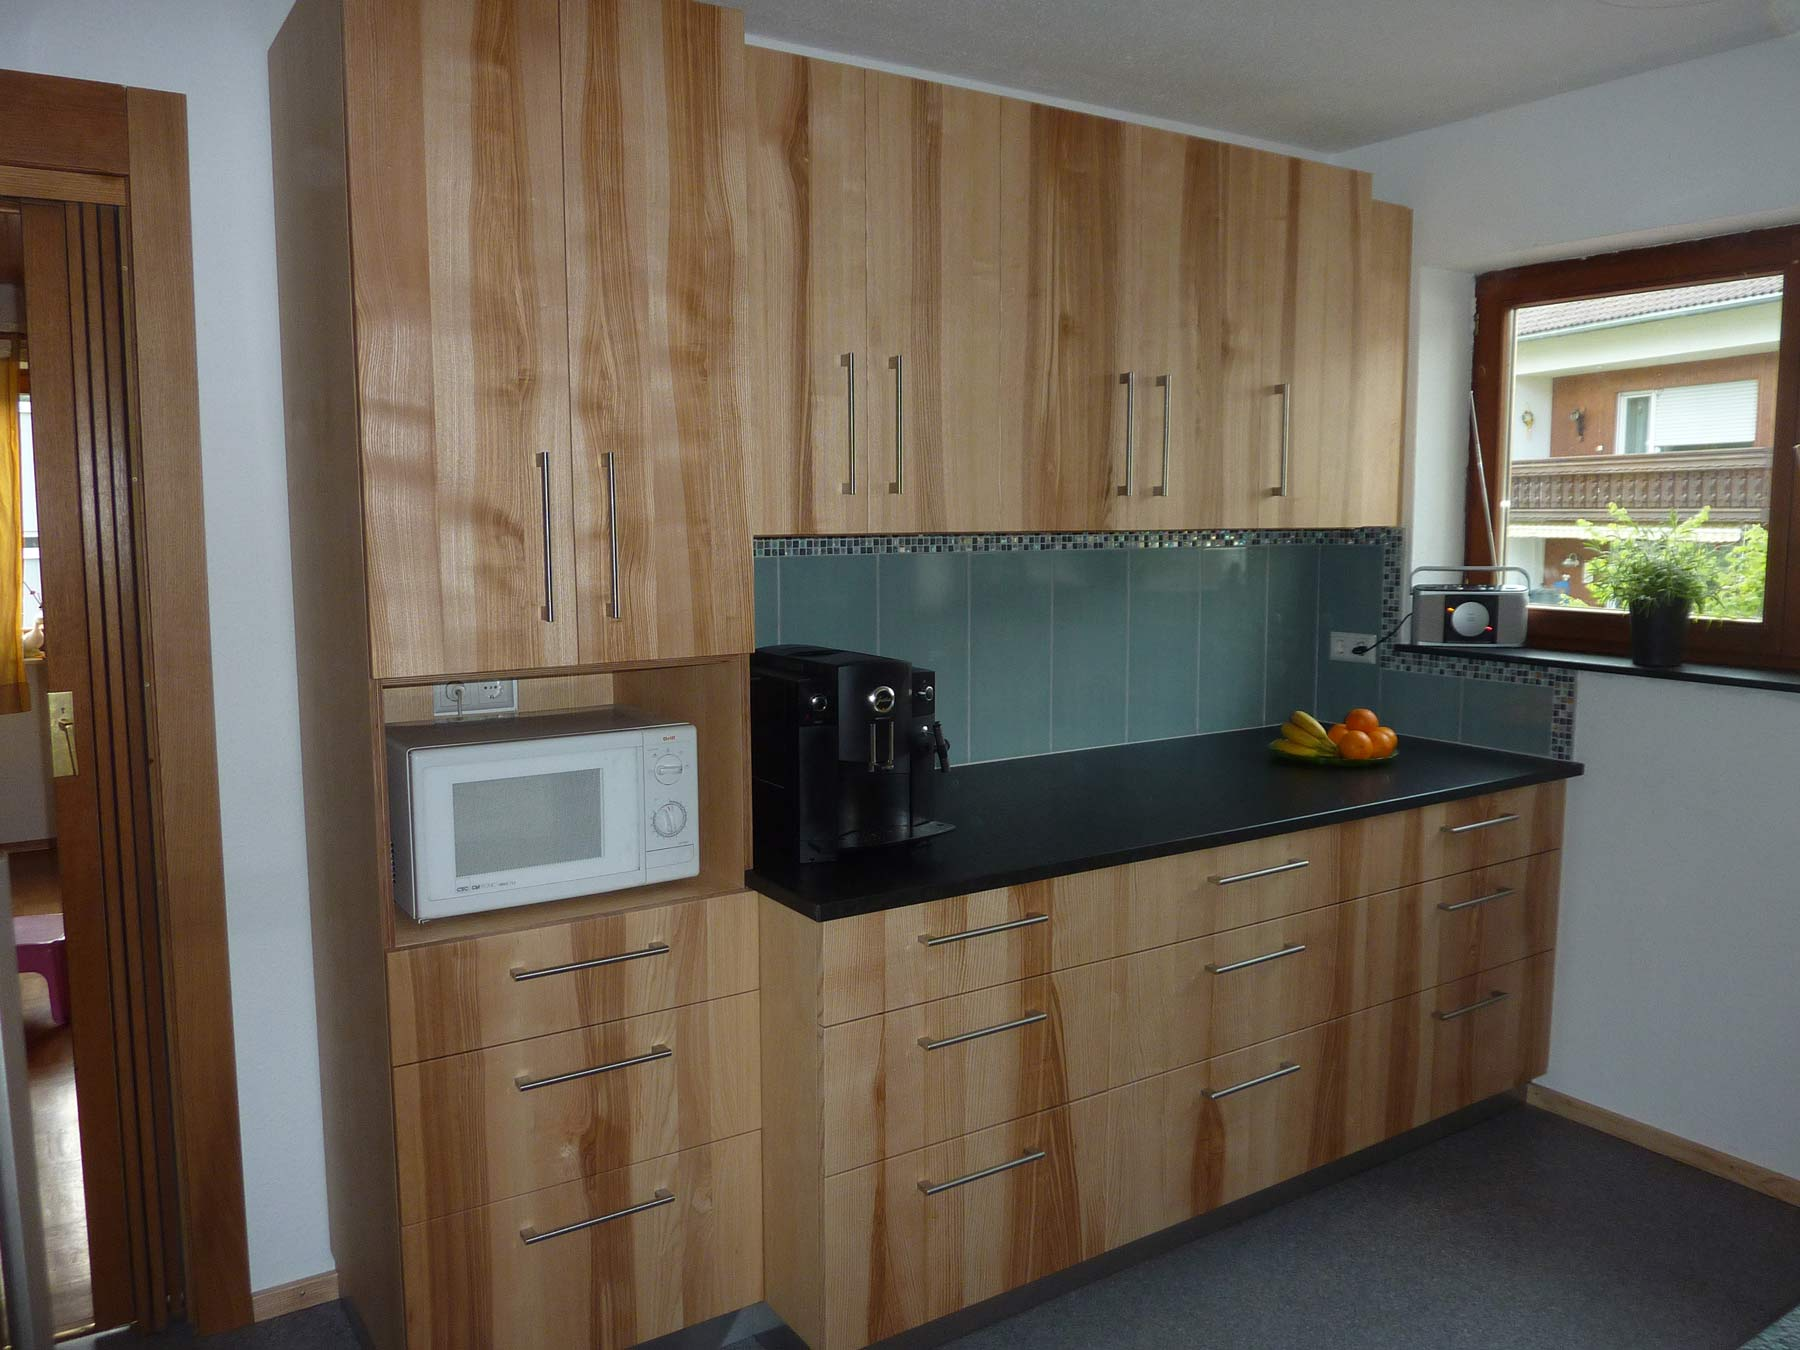 in esche massivholz - Esche Küche